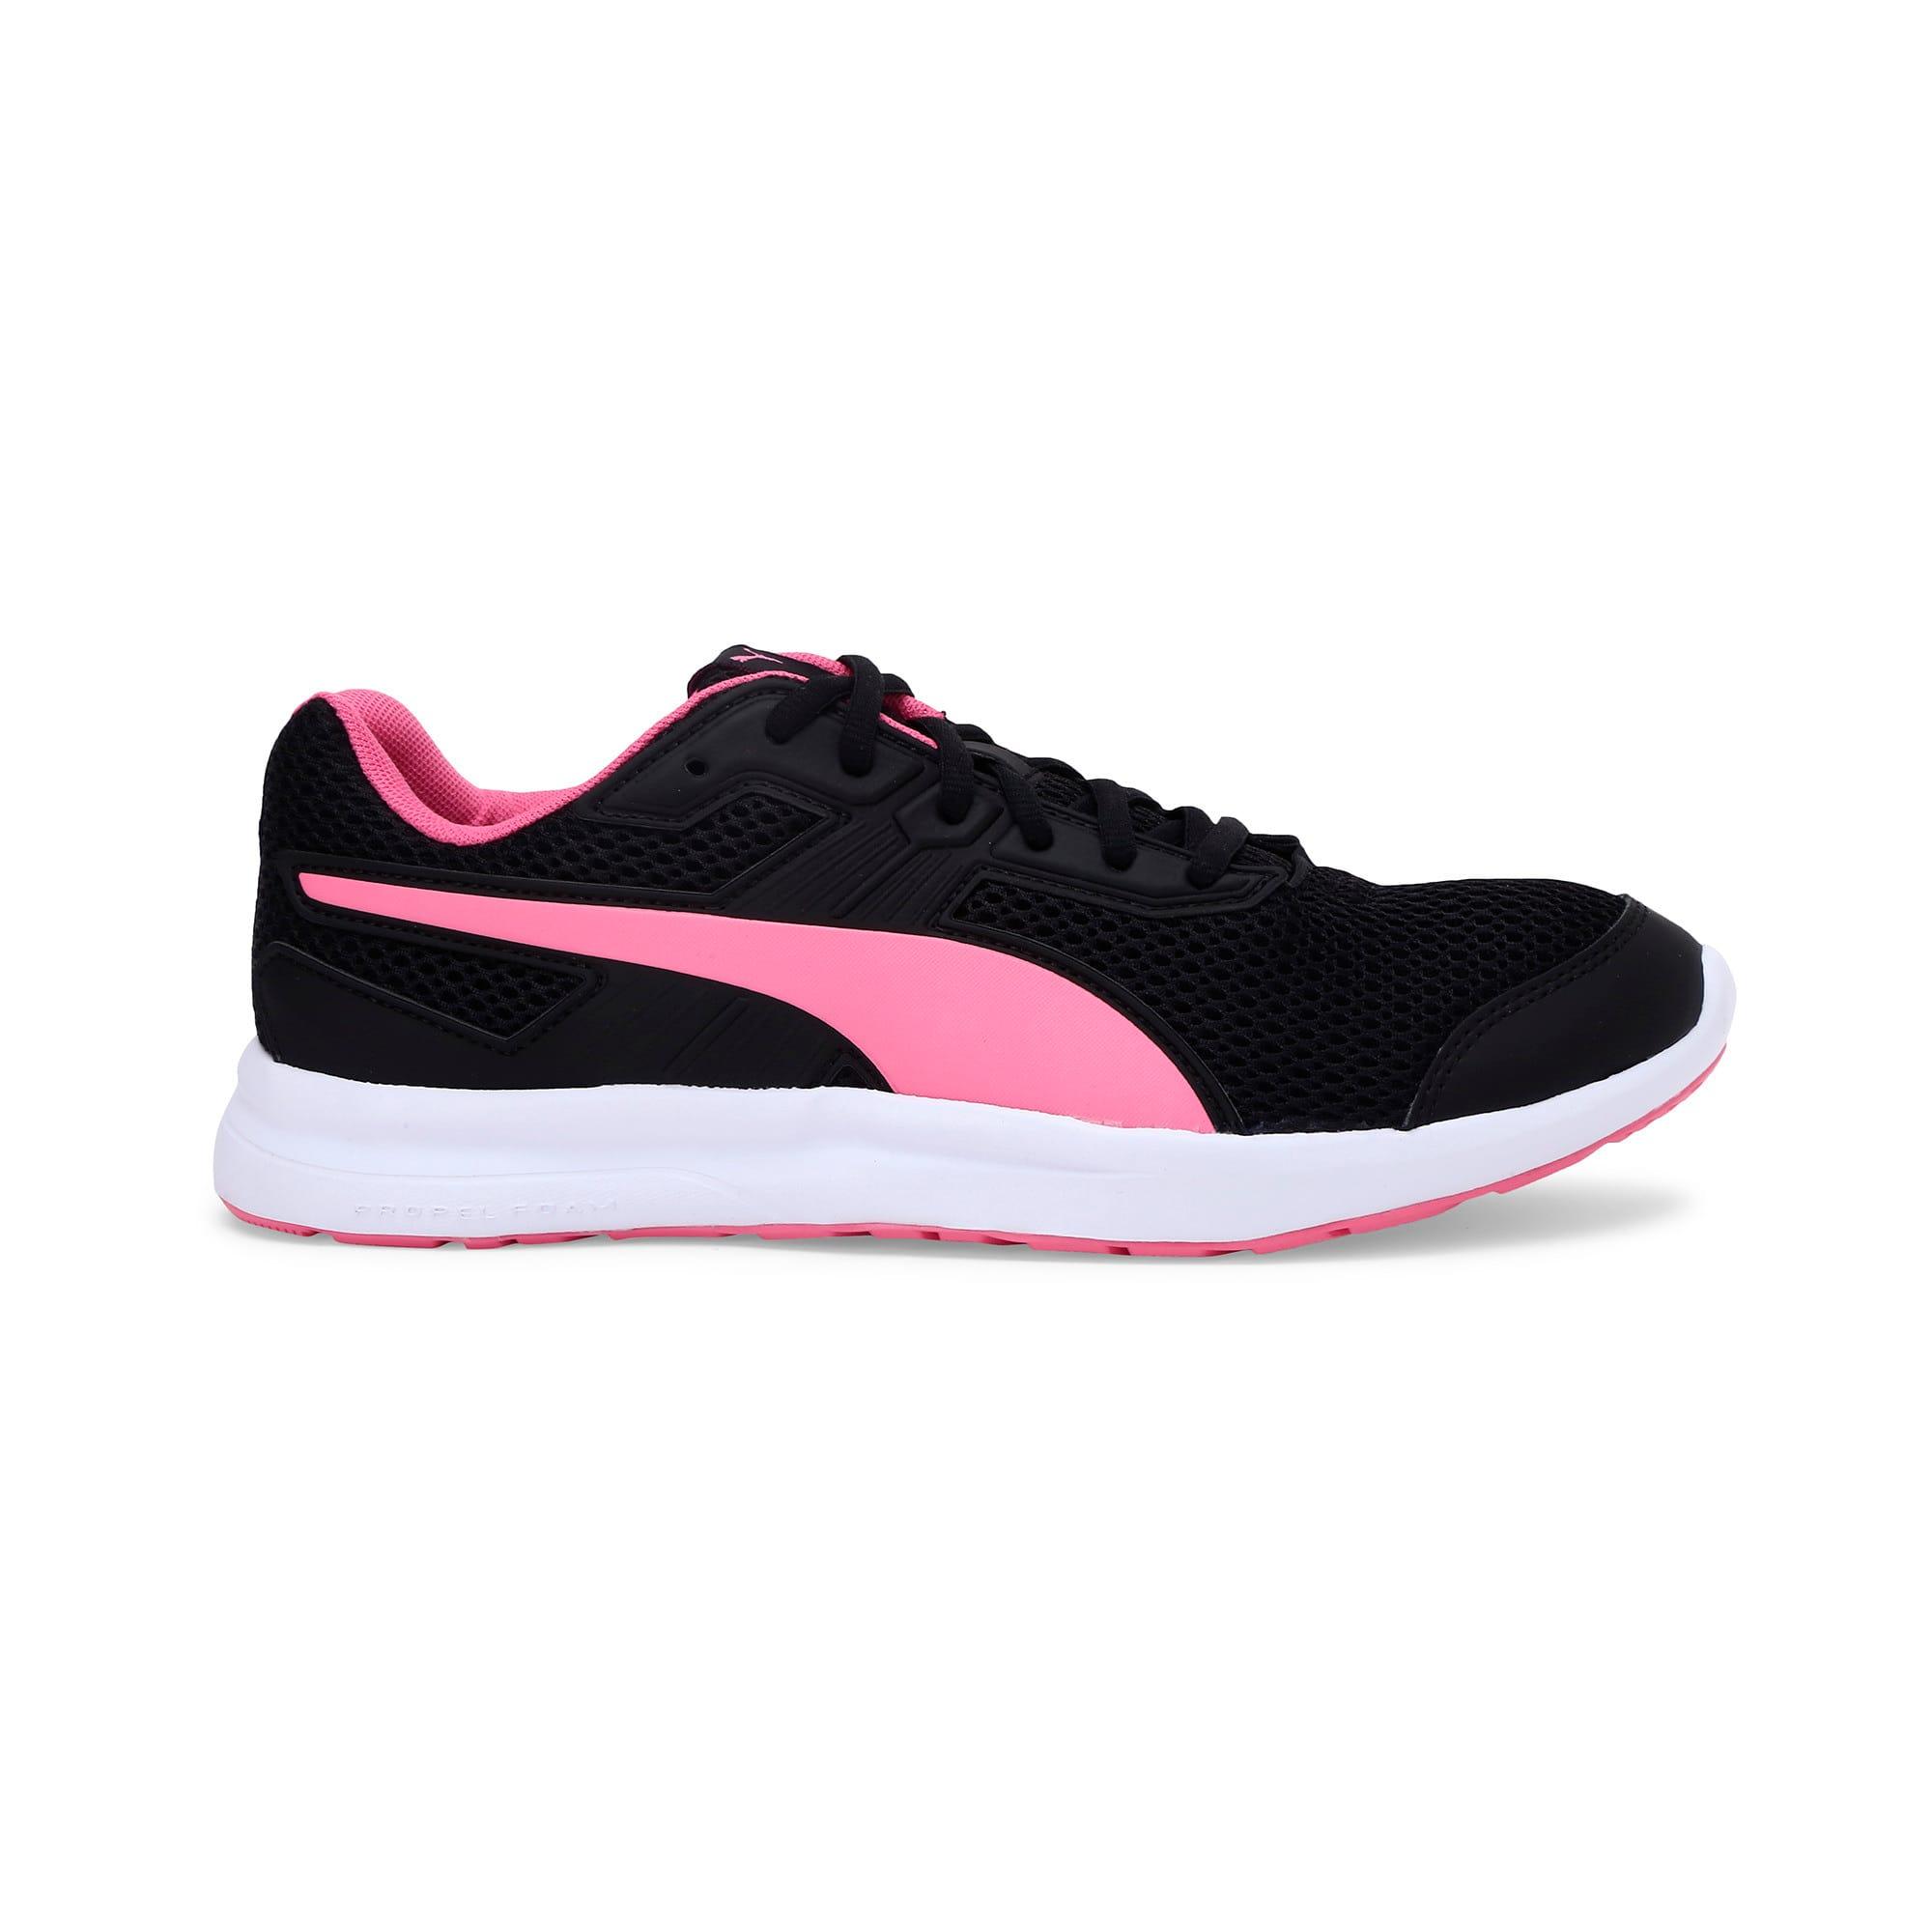 Thumbnail 7 of Escaper Training Shoes, Puma Black-Azalea Pink-White, medium-IND